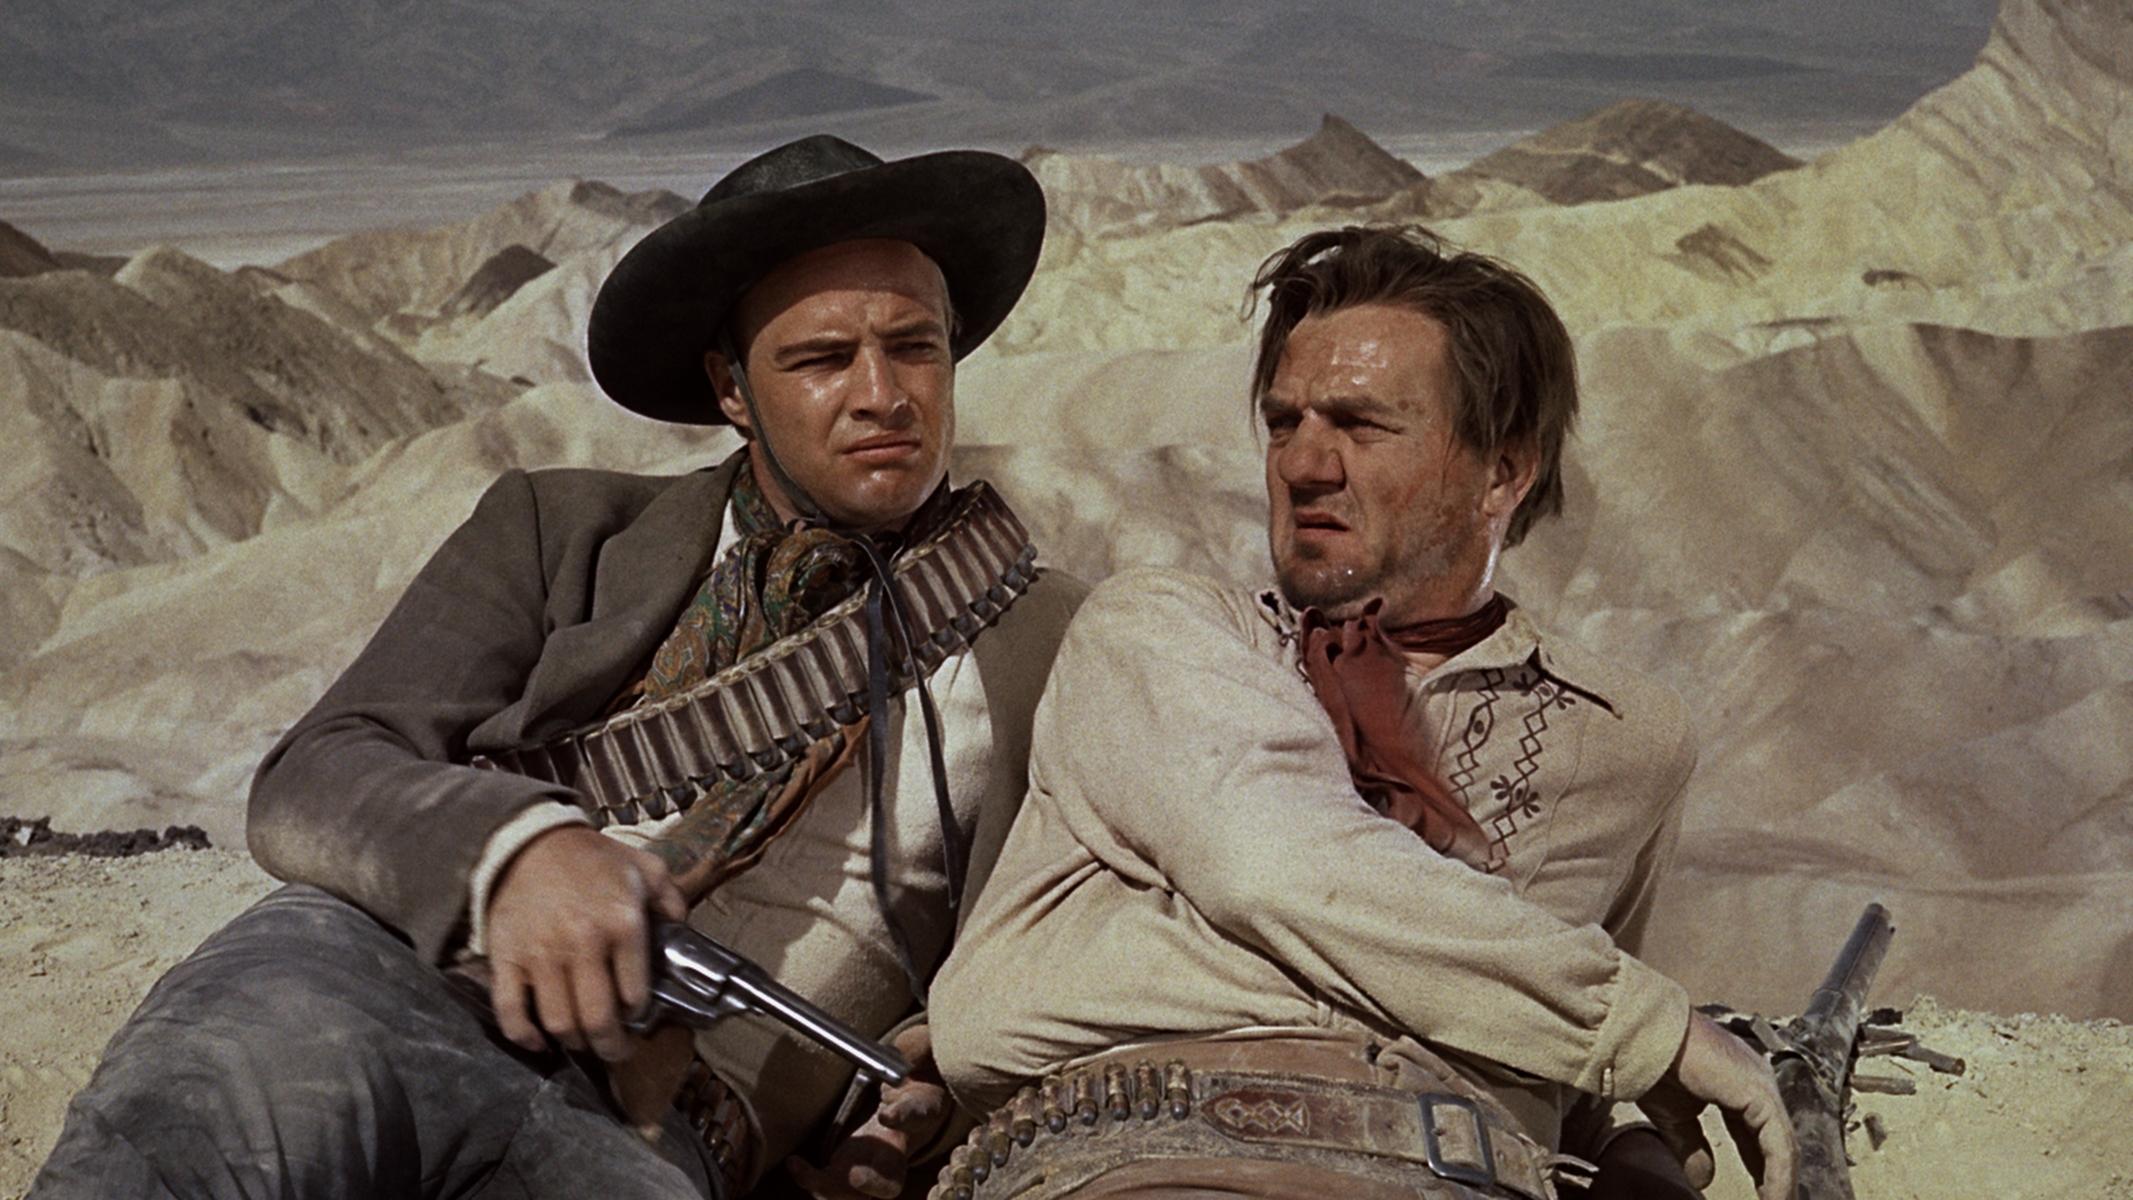 Marlon Brando and Karl Malden in One-Eyed Jacks (1961)